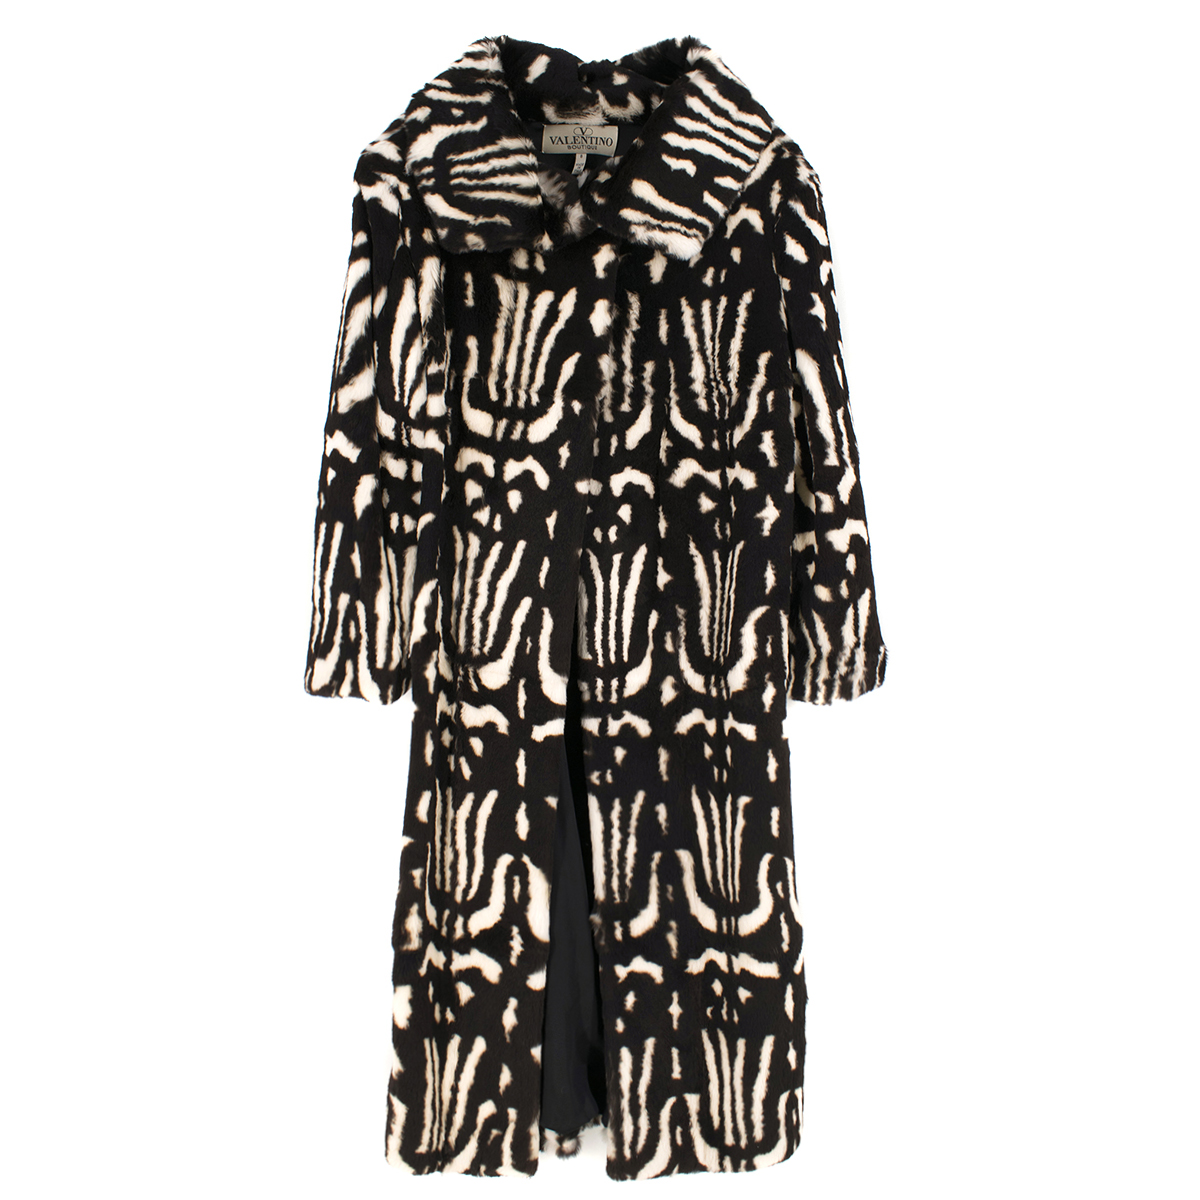 Valentino Boutique Abstract Print Rabbit Fur Long Coat